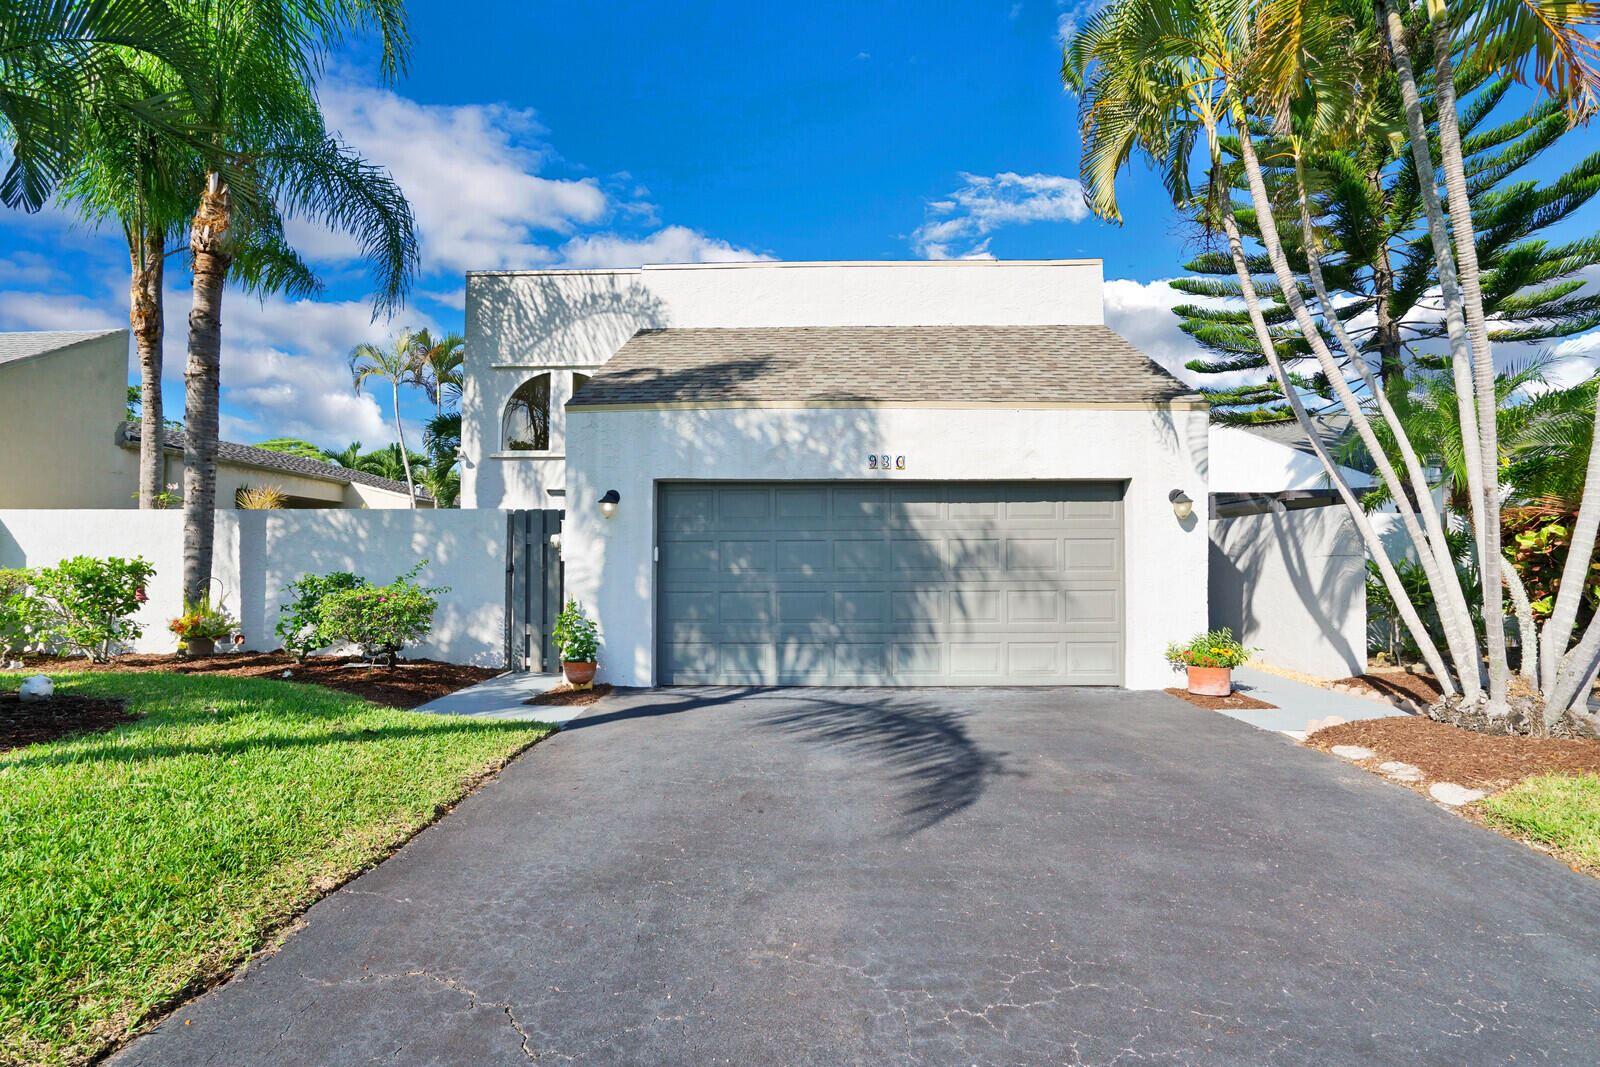 930 NW 22nd Avenue, Delray Beach, FL 33445 - MLS#: RX-10752374